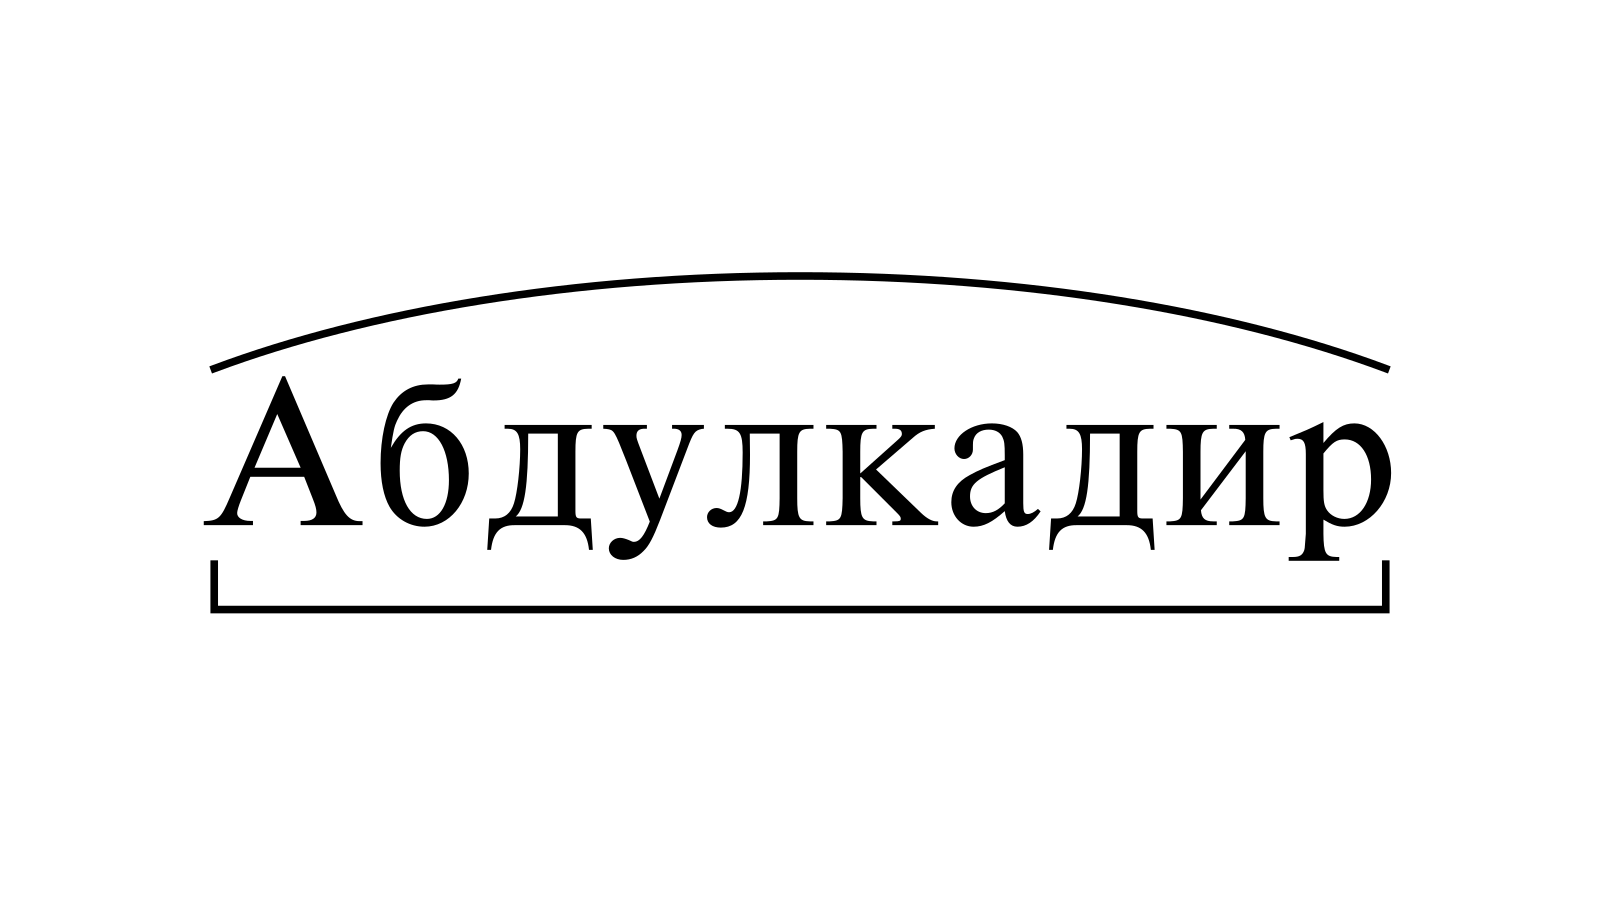 Разбор слова «Абдулкадир» по составу